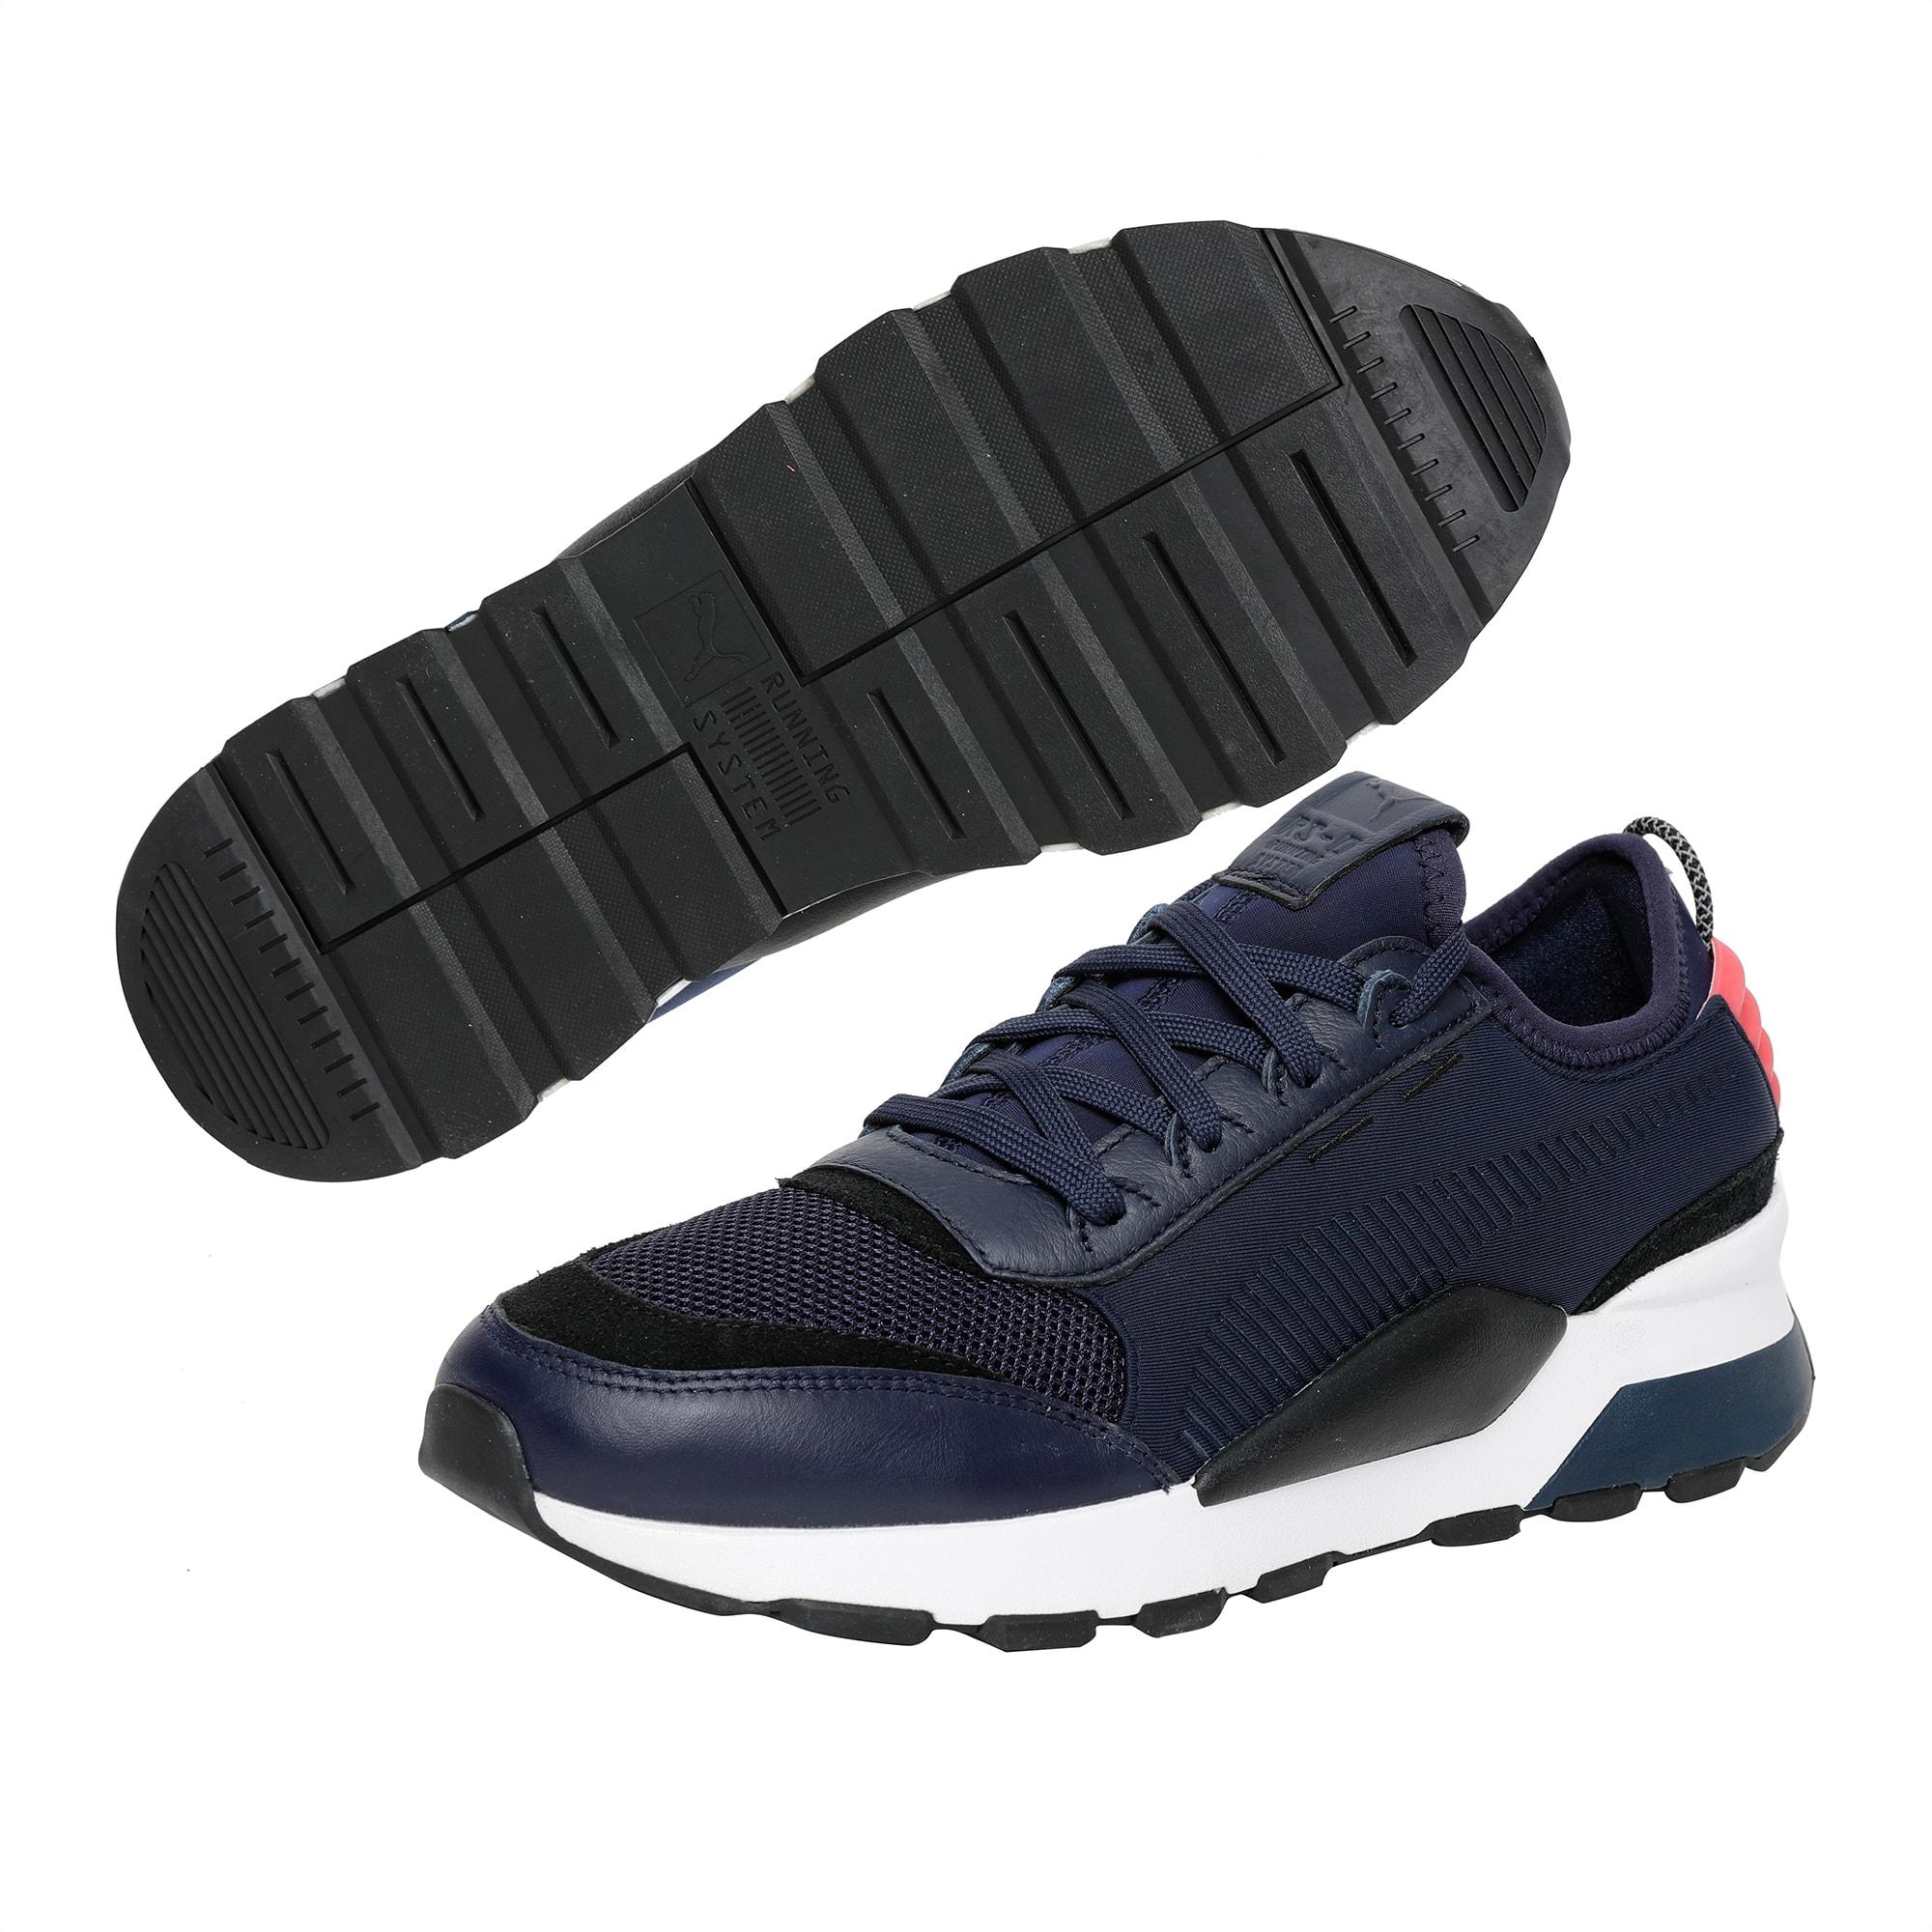 RS 0 Core Shoes